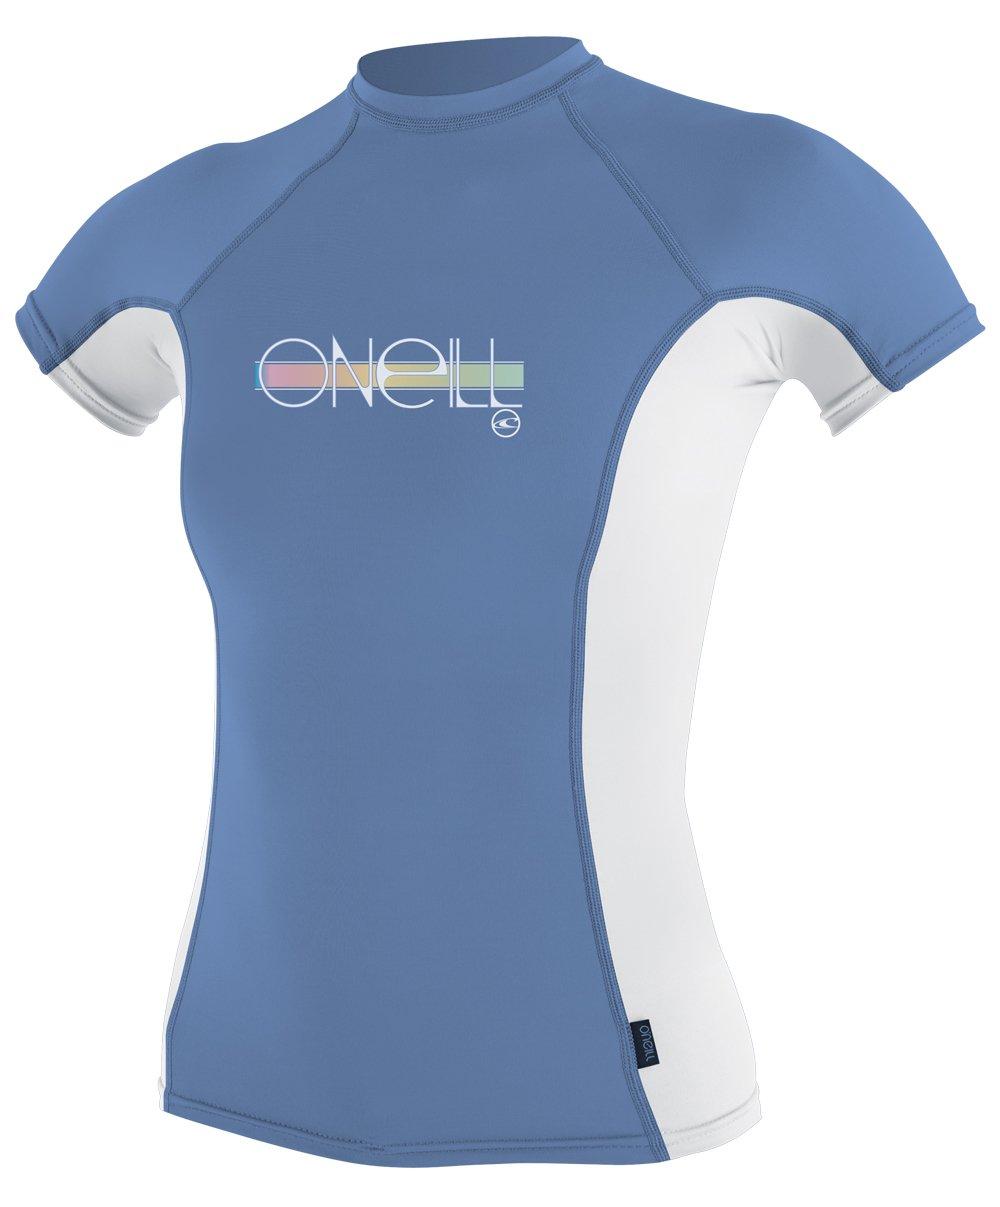 O'Neill UV Sun Protection Girls Skins Short Sleeve